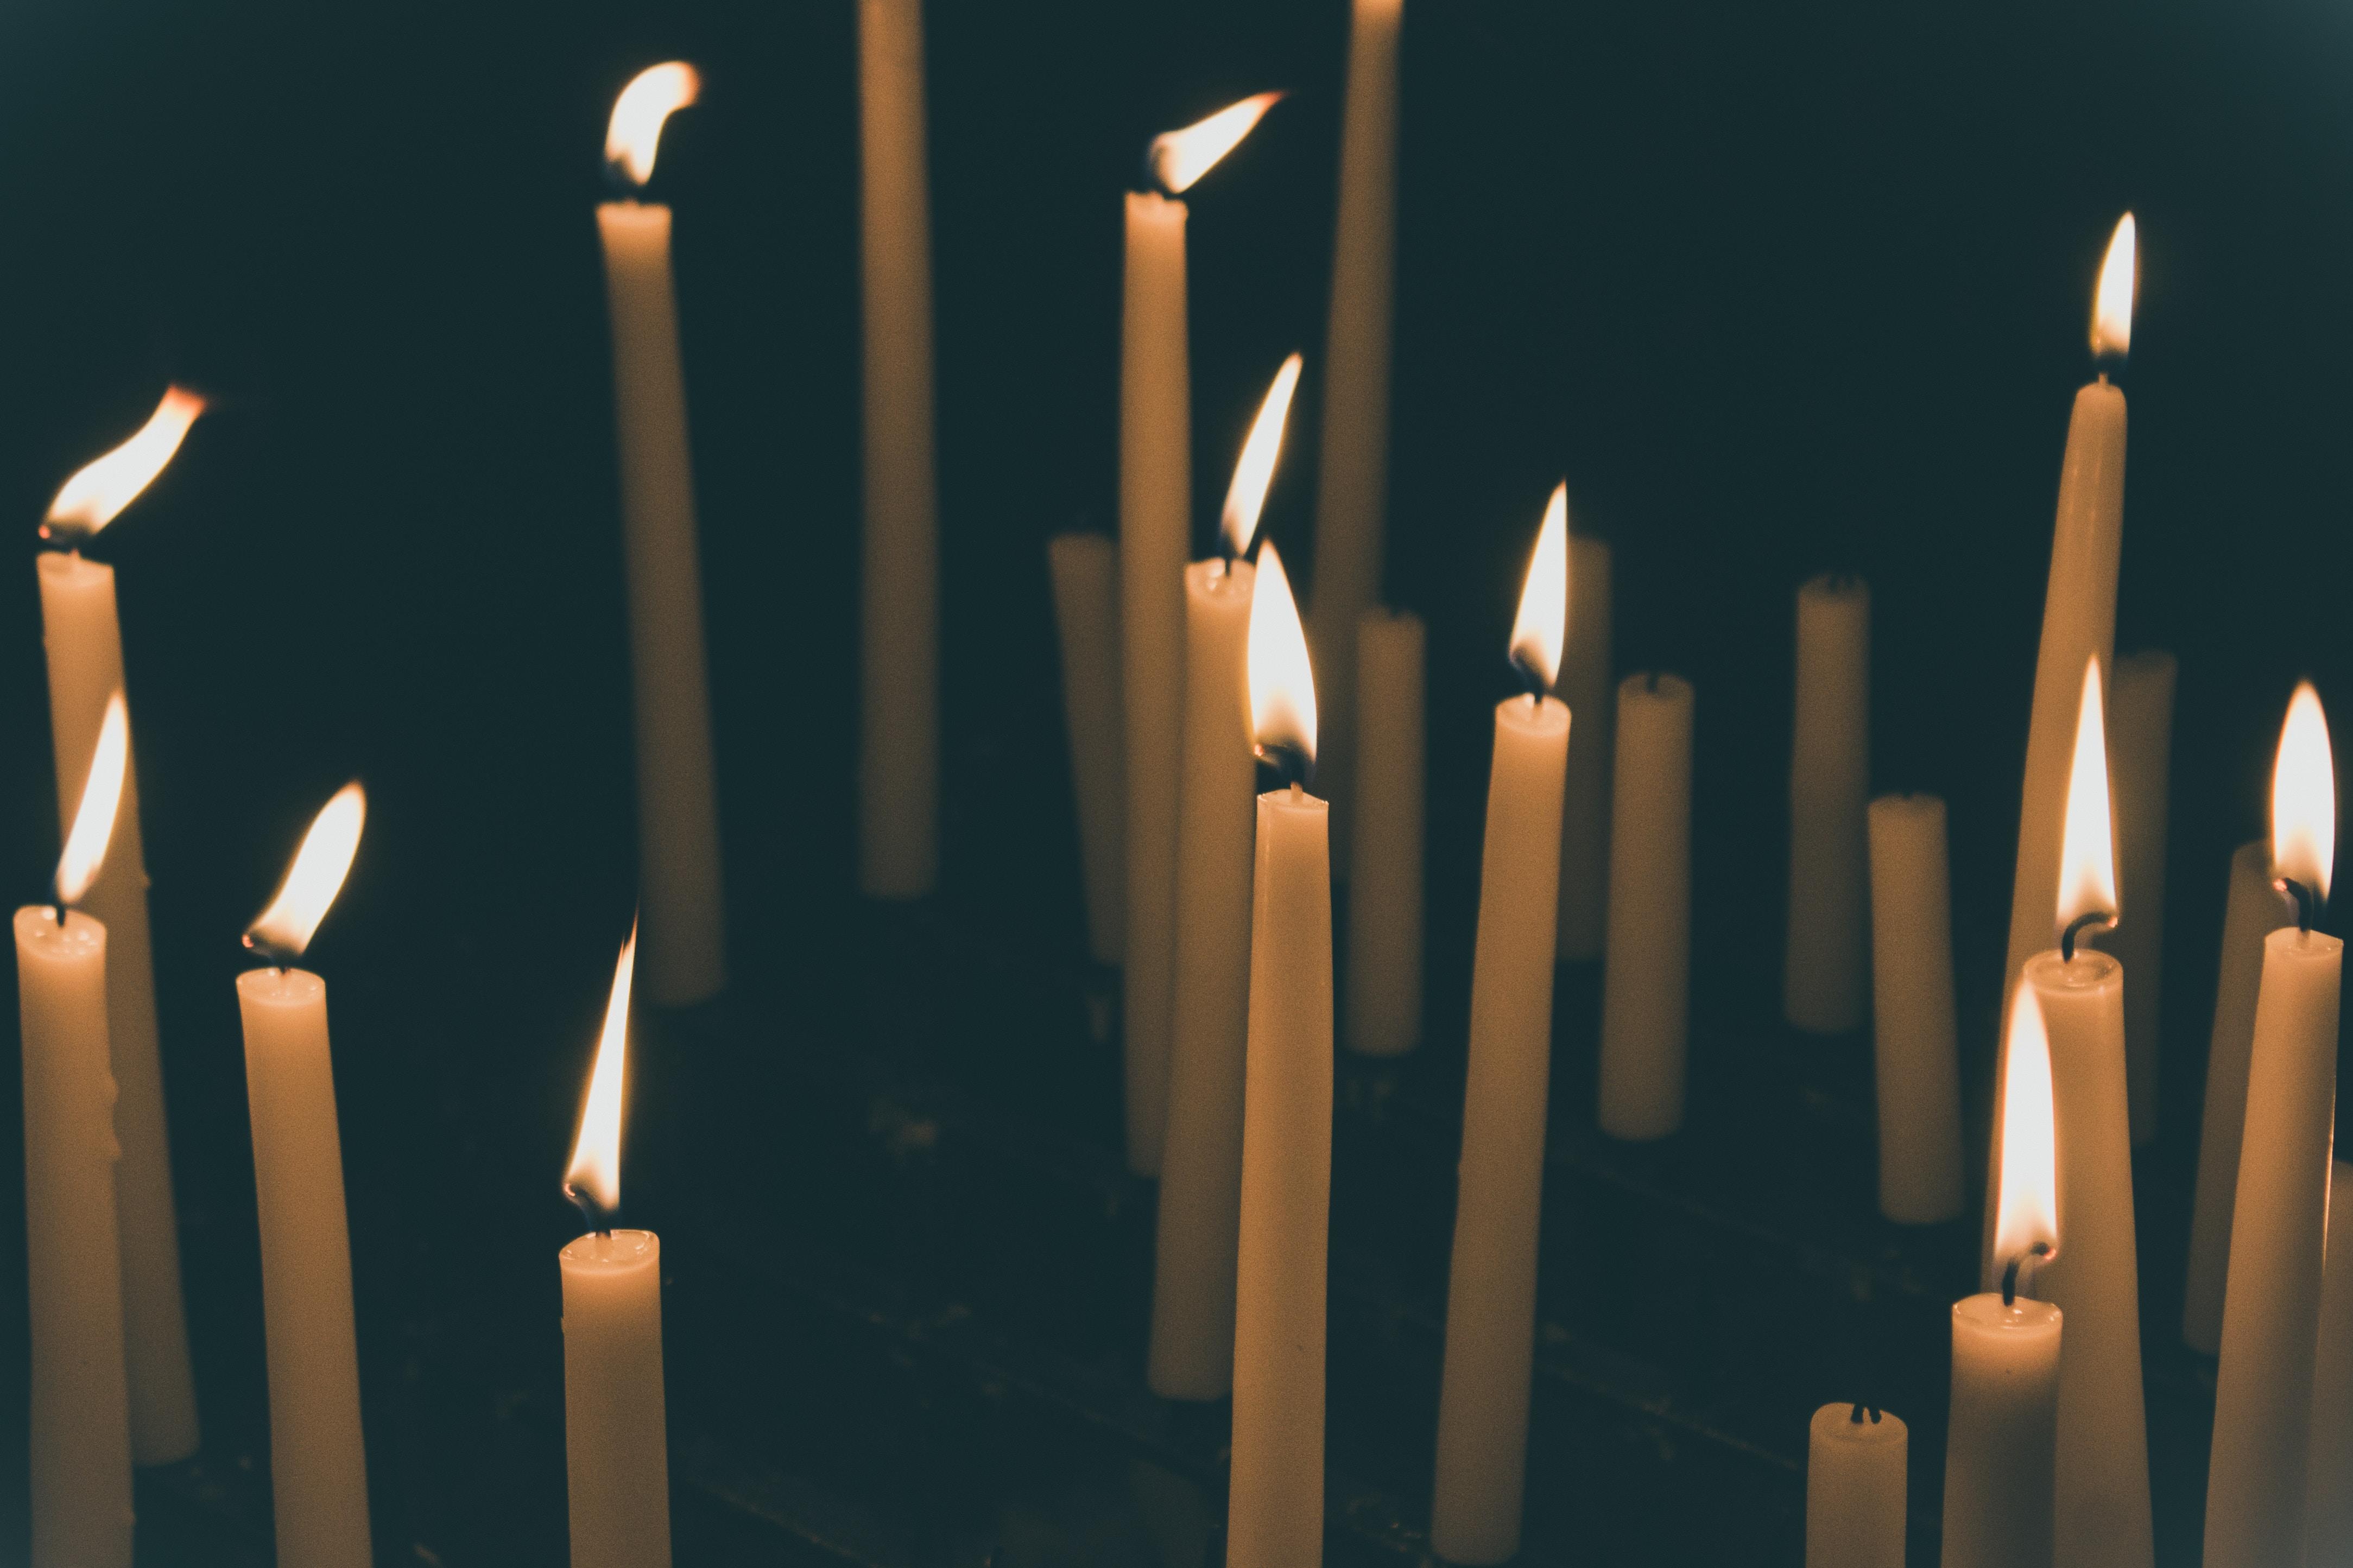 Tall candlesticks burning besides shorter unlit candlesticks in the dark